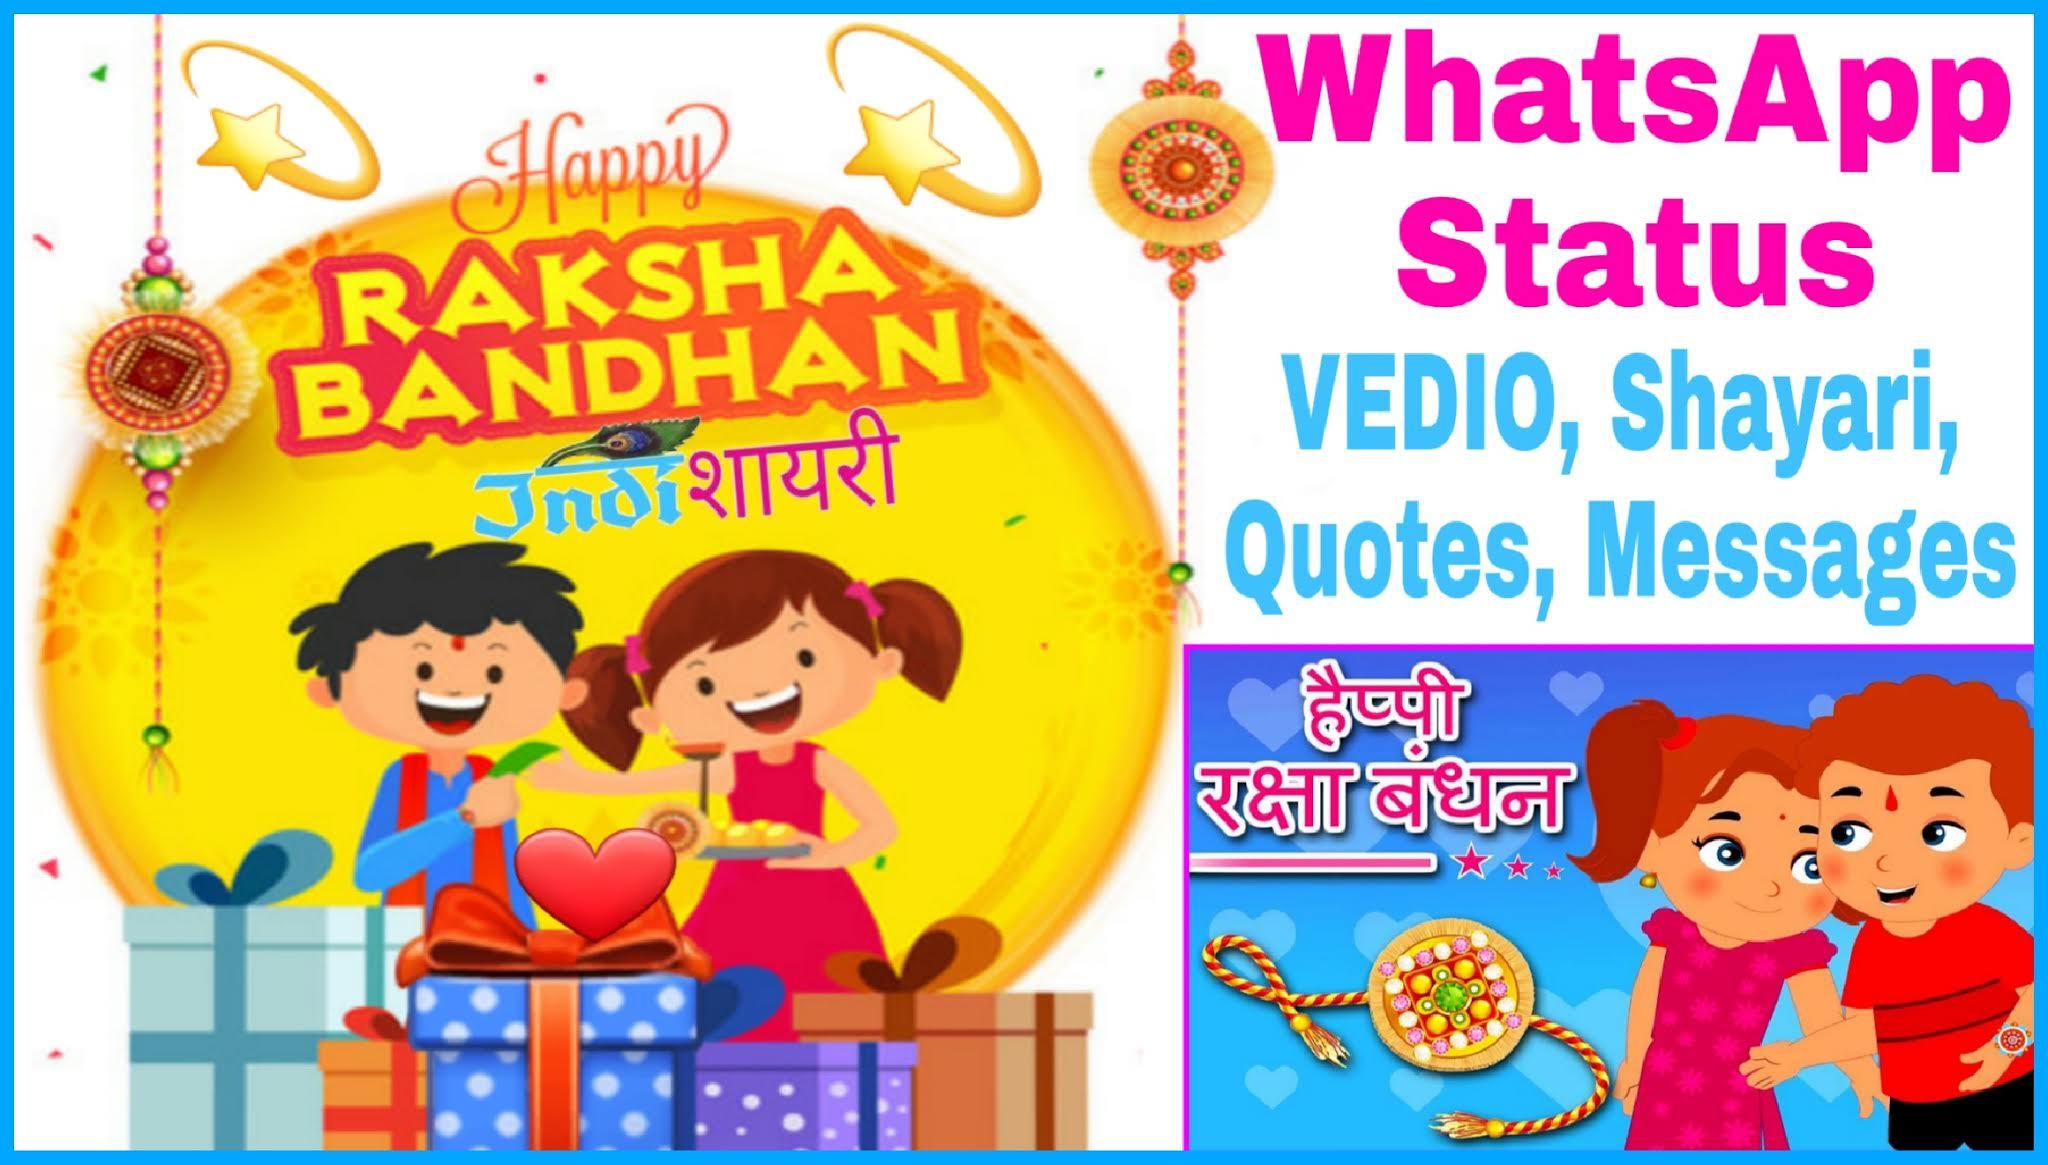 [BEST] Raksha Bandhan Status Video For WhatsApp, FB, Instagram